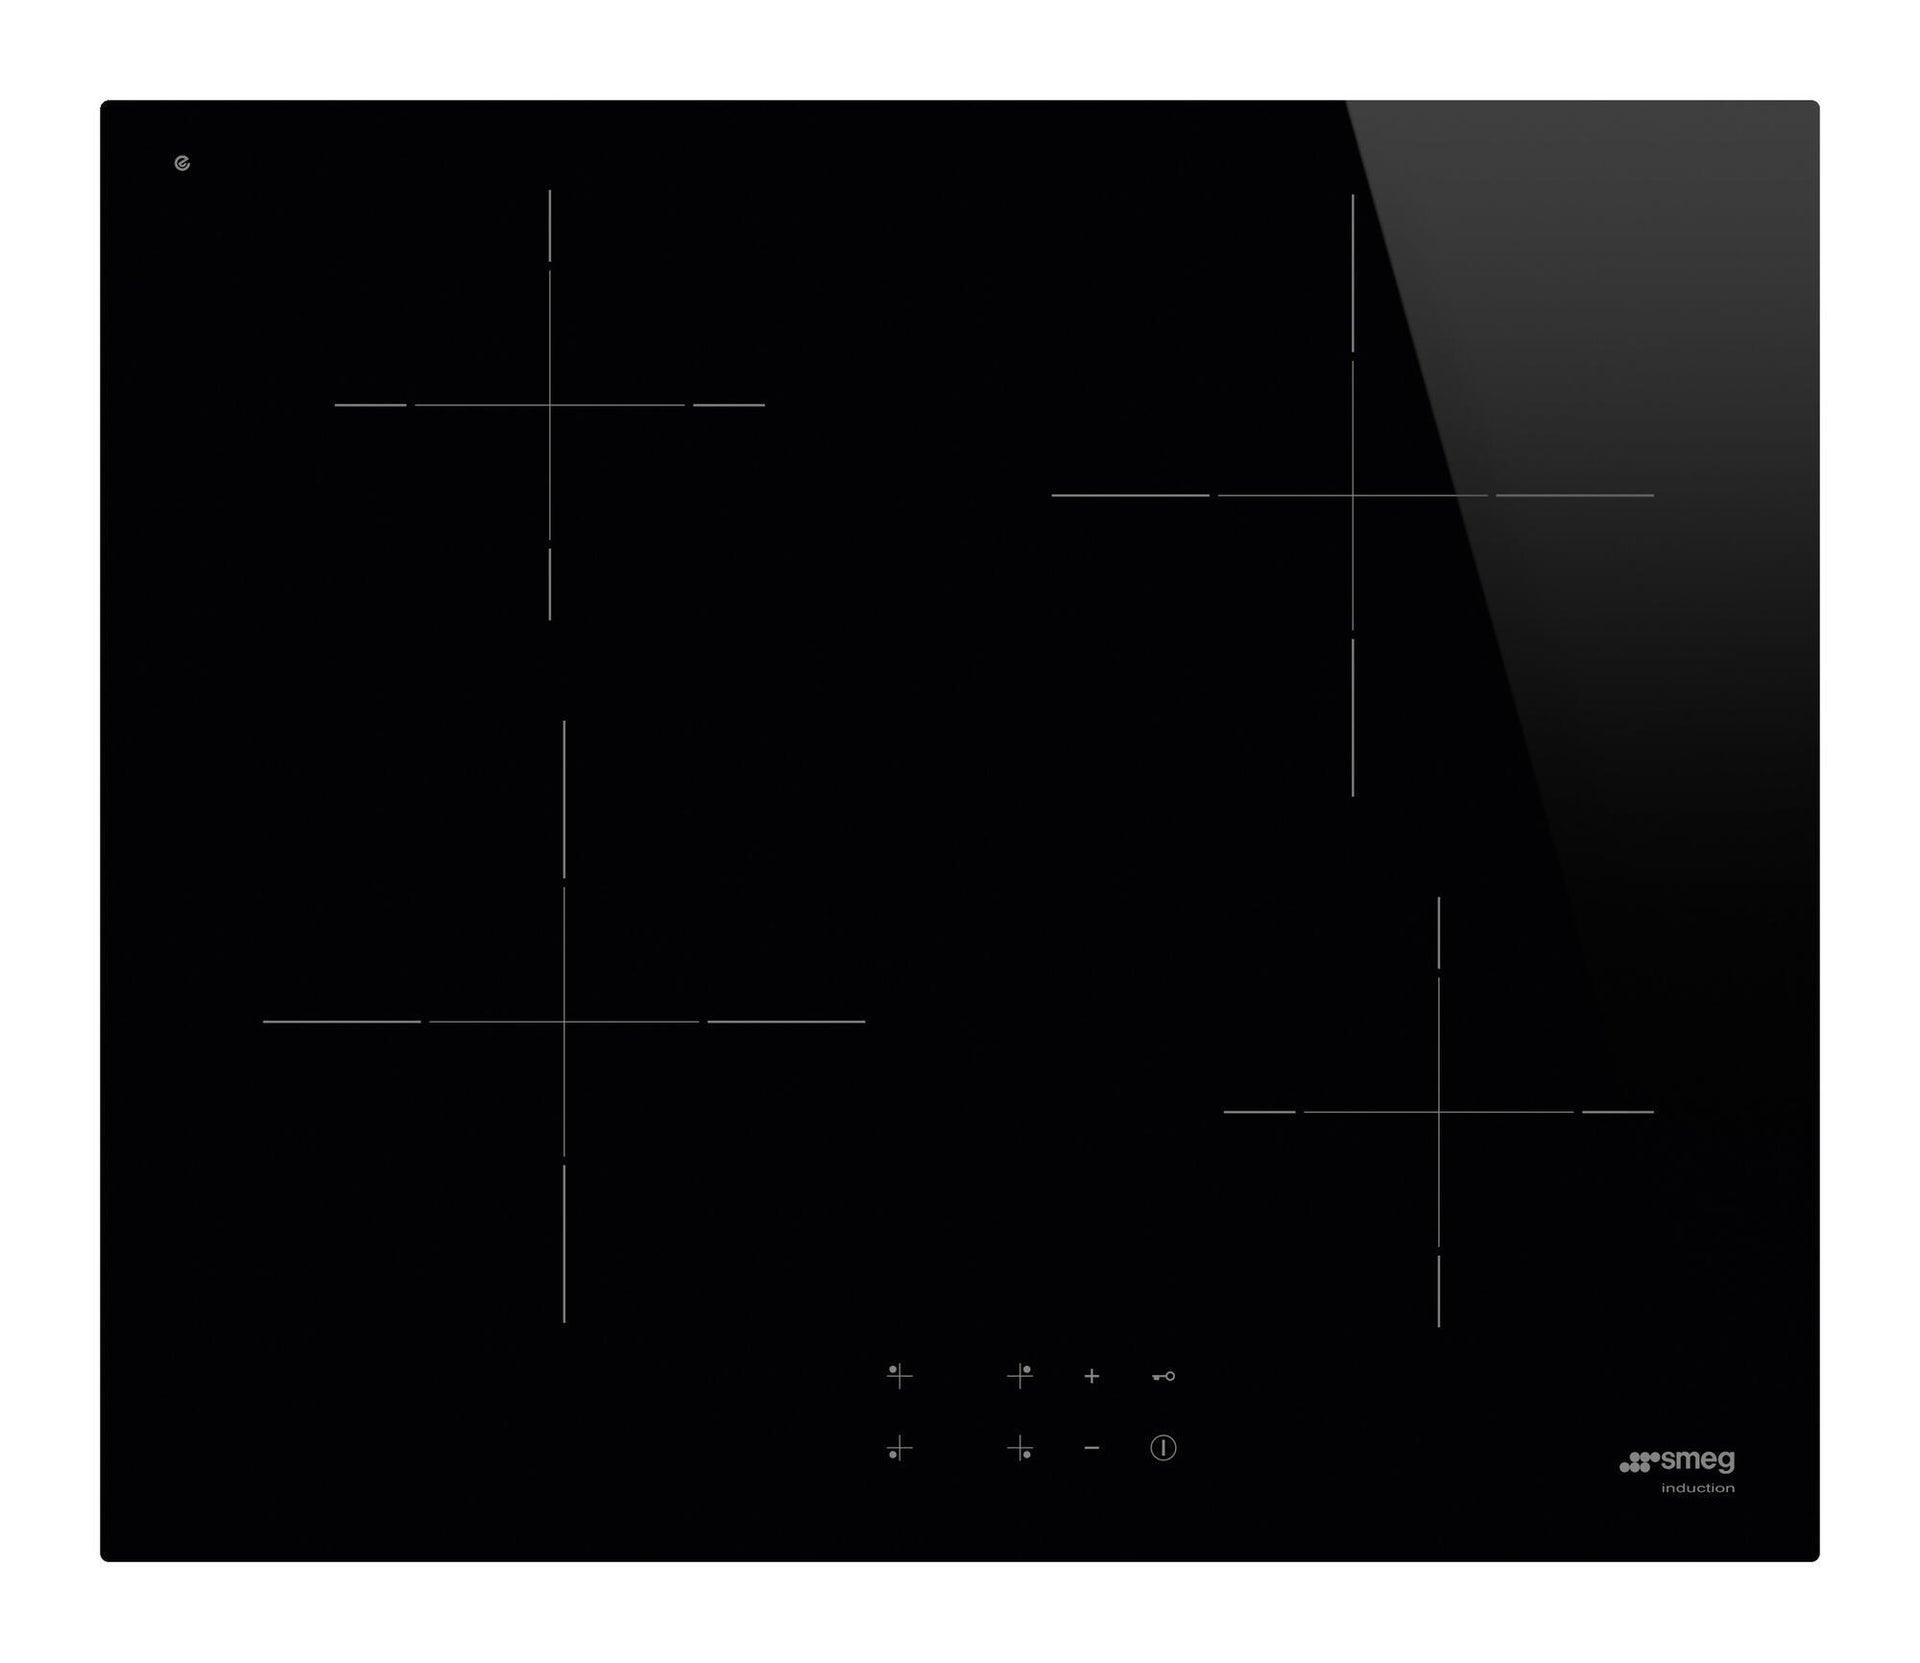 Piano cottura induzione 56 cm SMEG SI2641D - 2